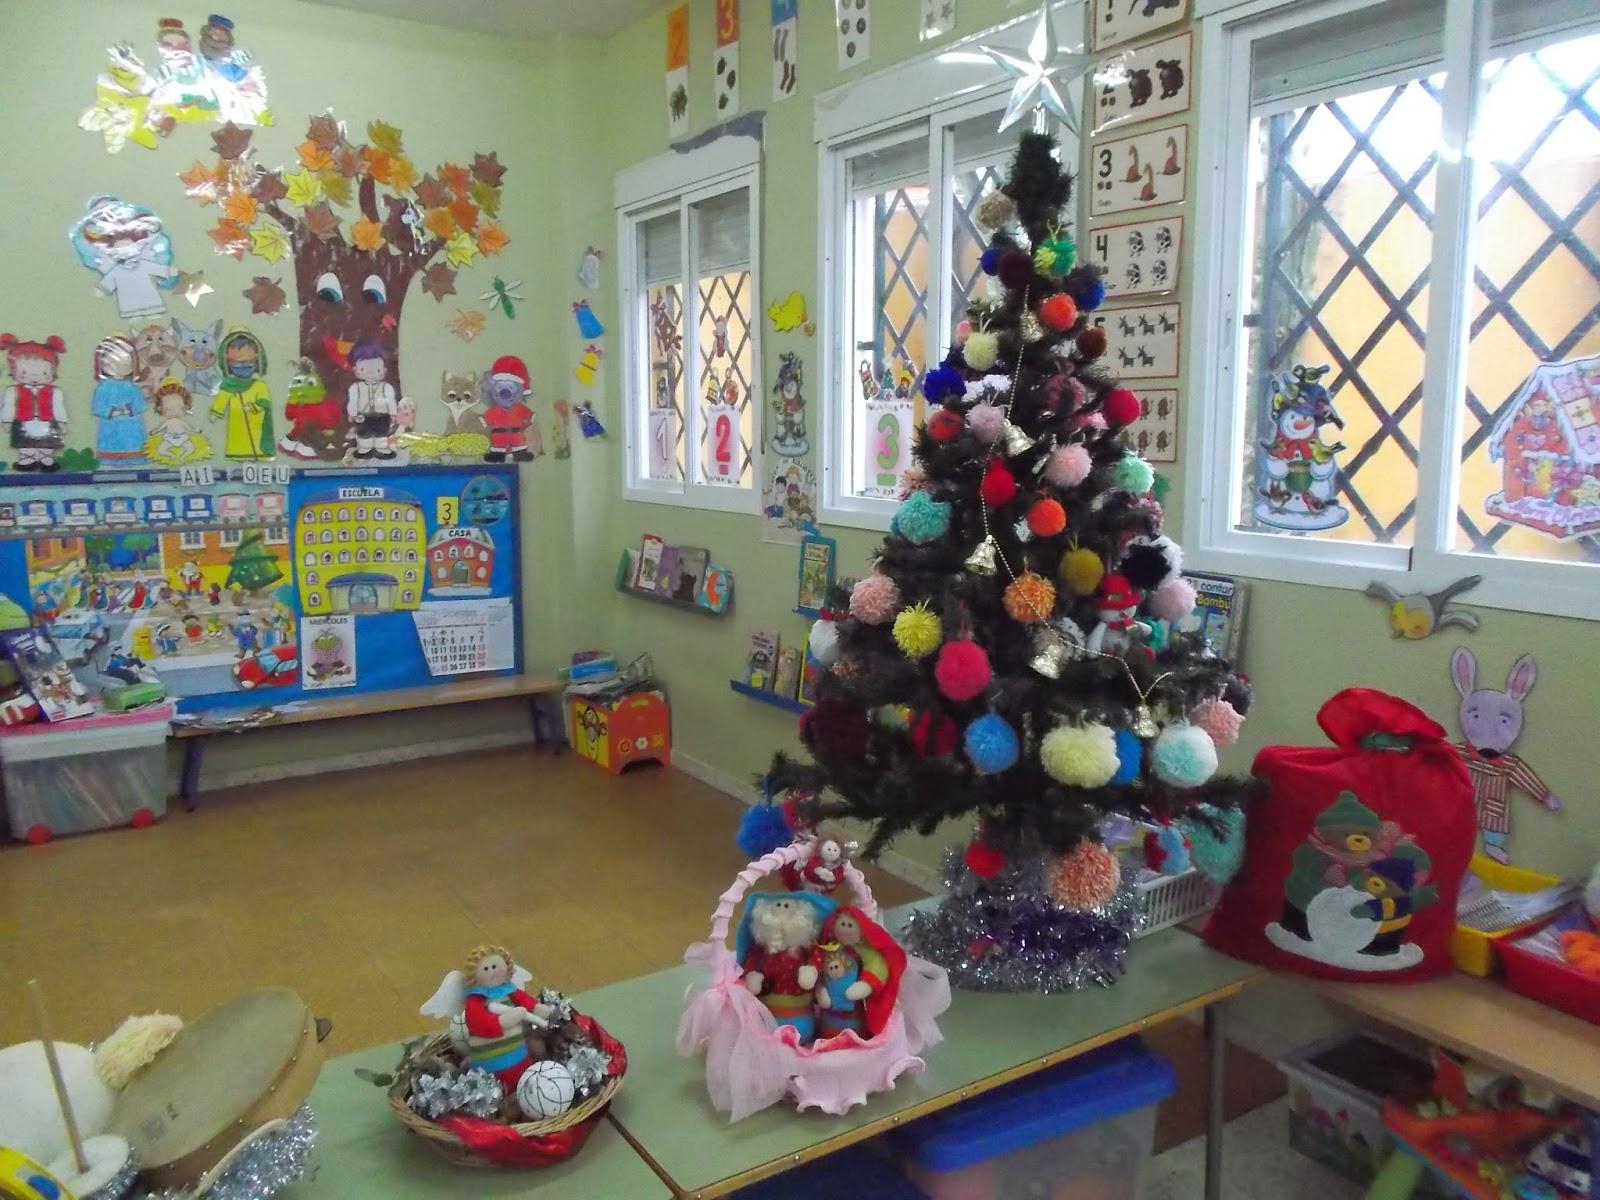 Adorno de salon de clases decoracion de salones estupendo for Decoracion de salon navideno